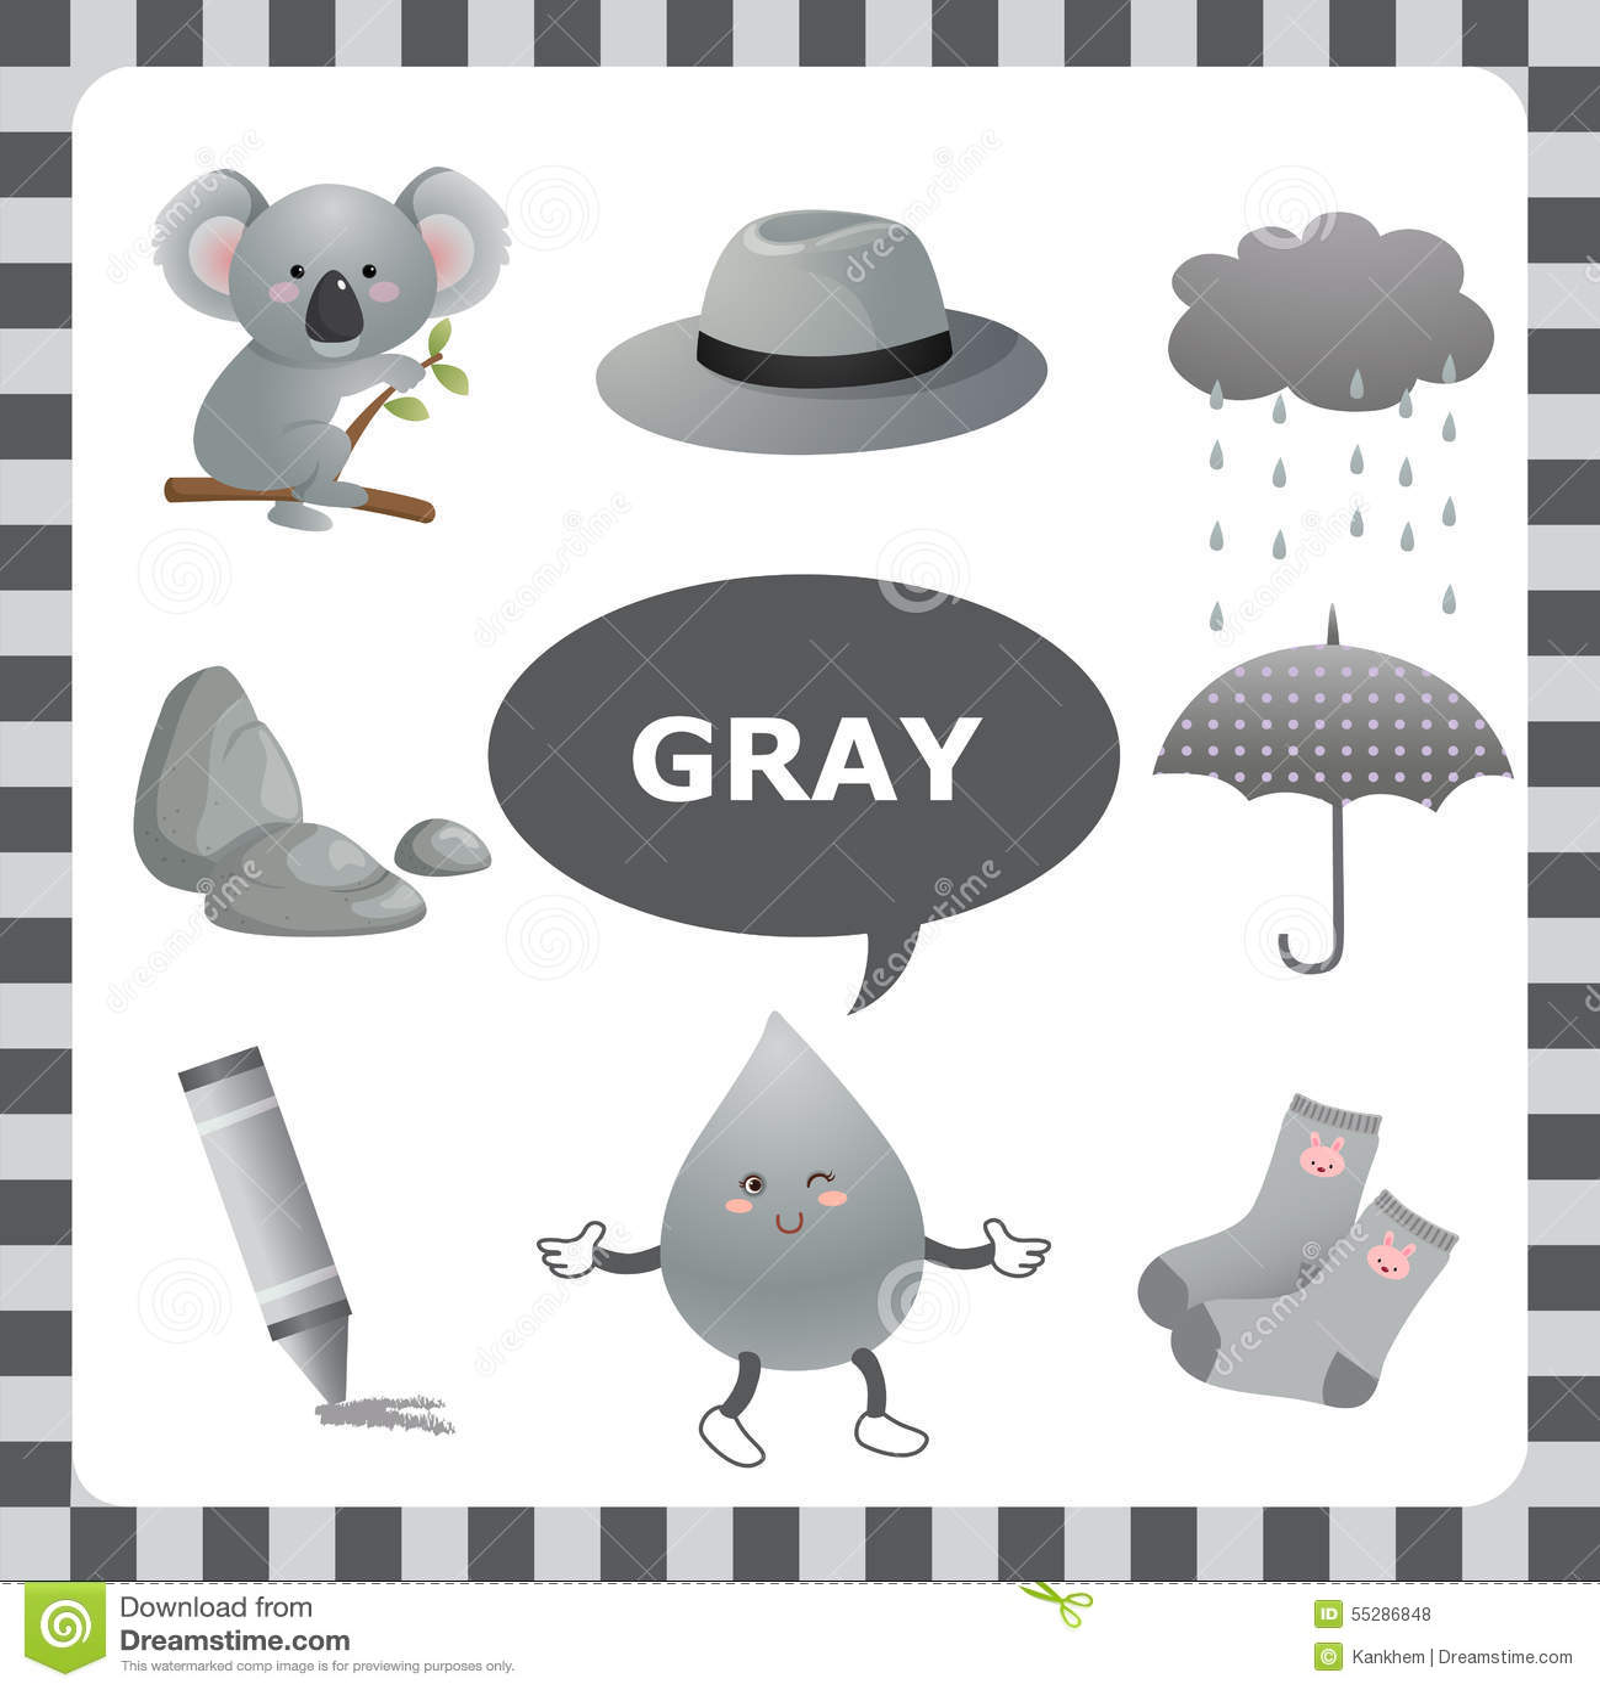 Gray Color Stock Vector